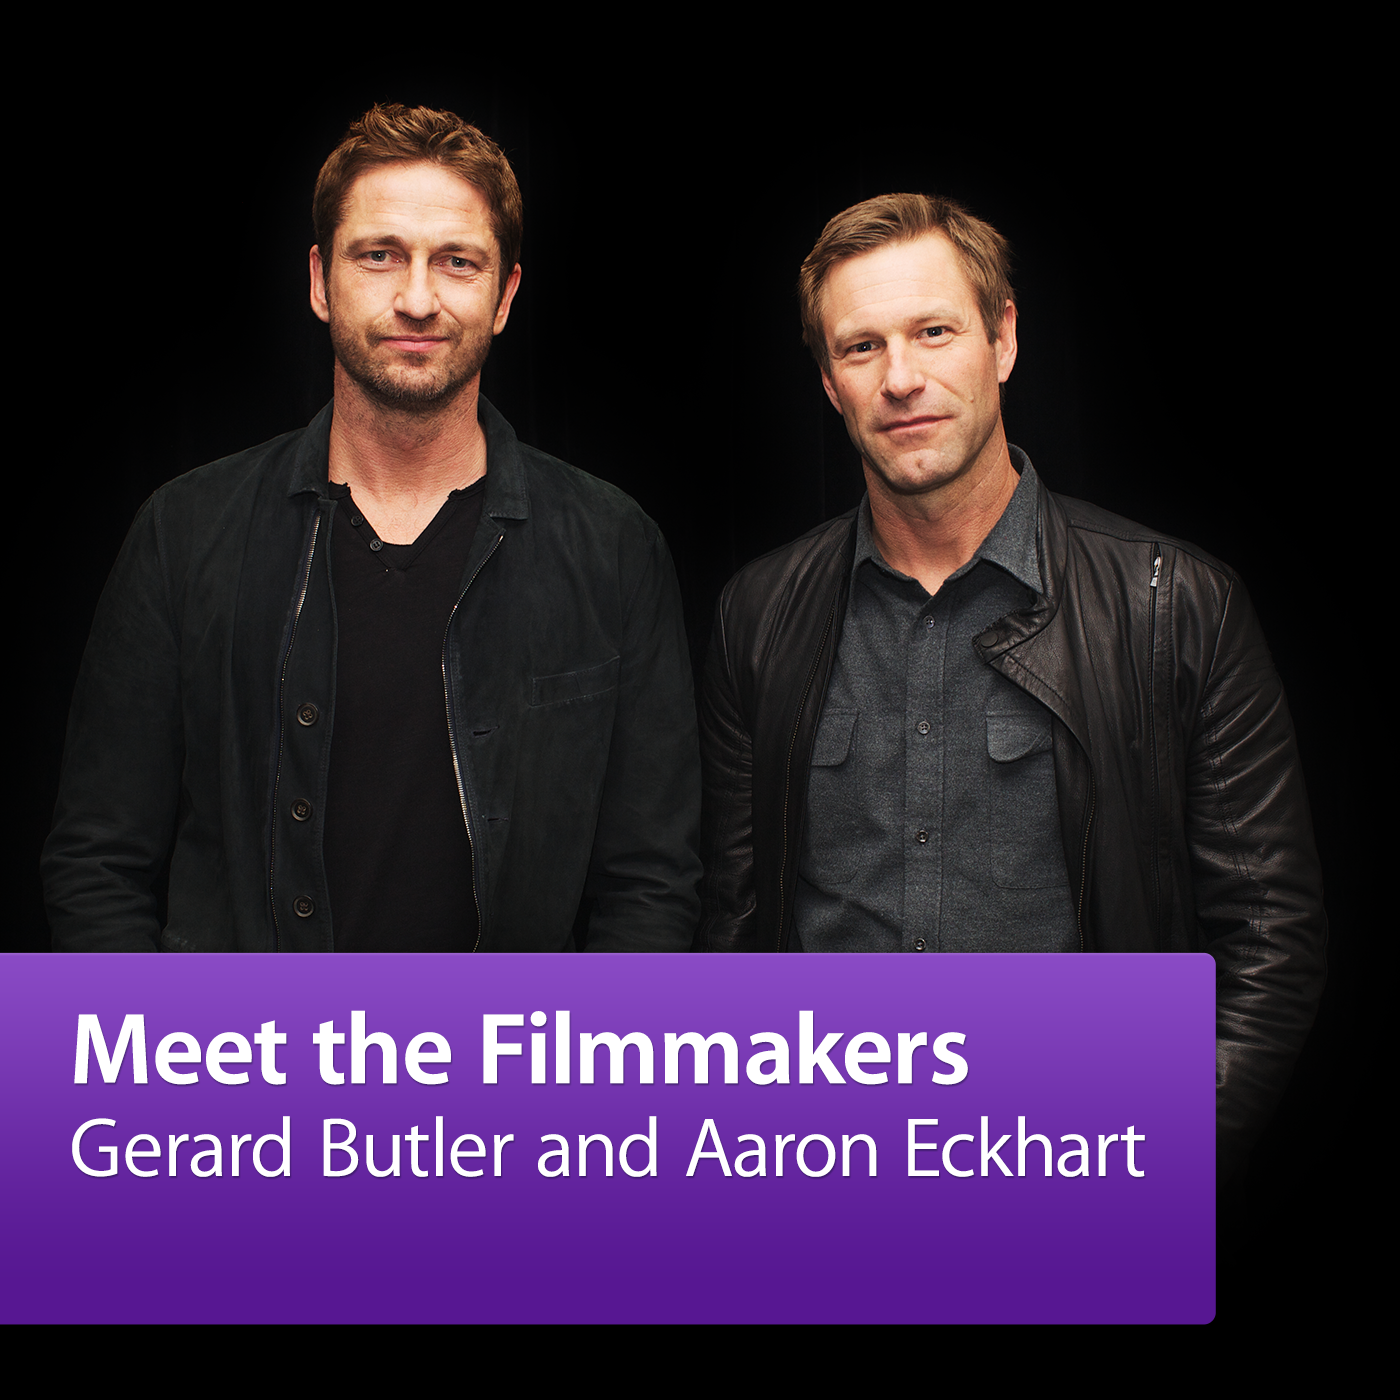 Gerard Butler and Aaron Eckhart: Meet the Filmmakers